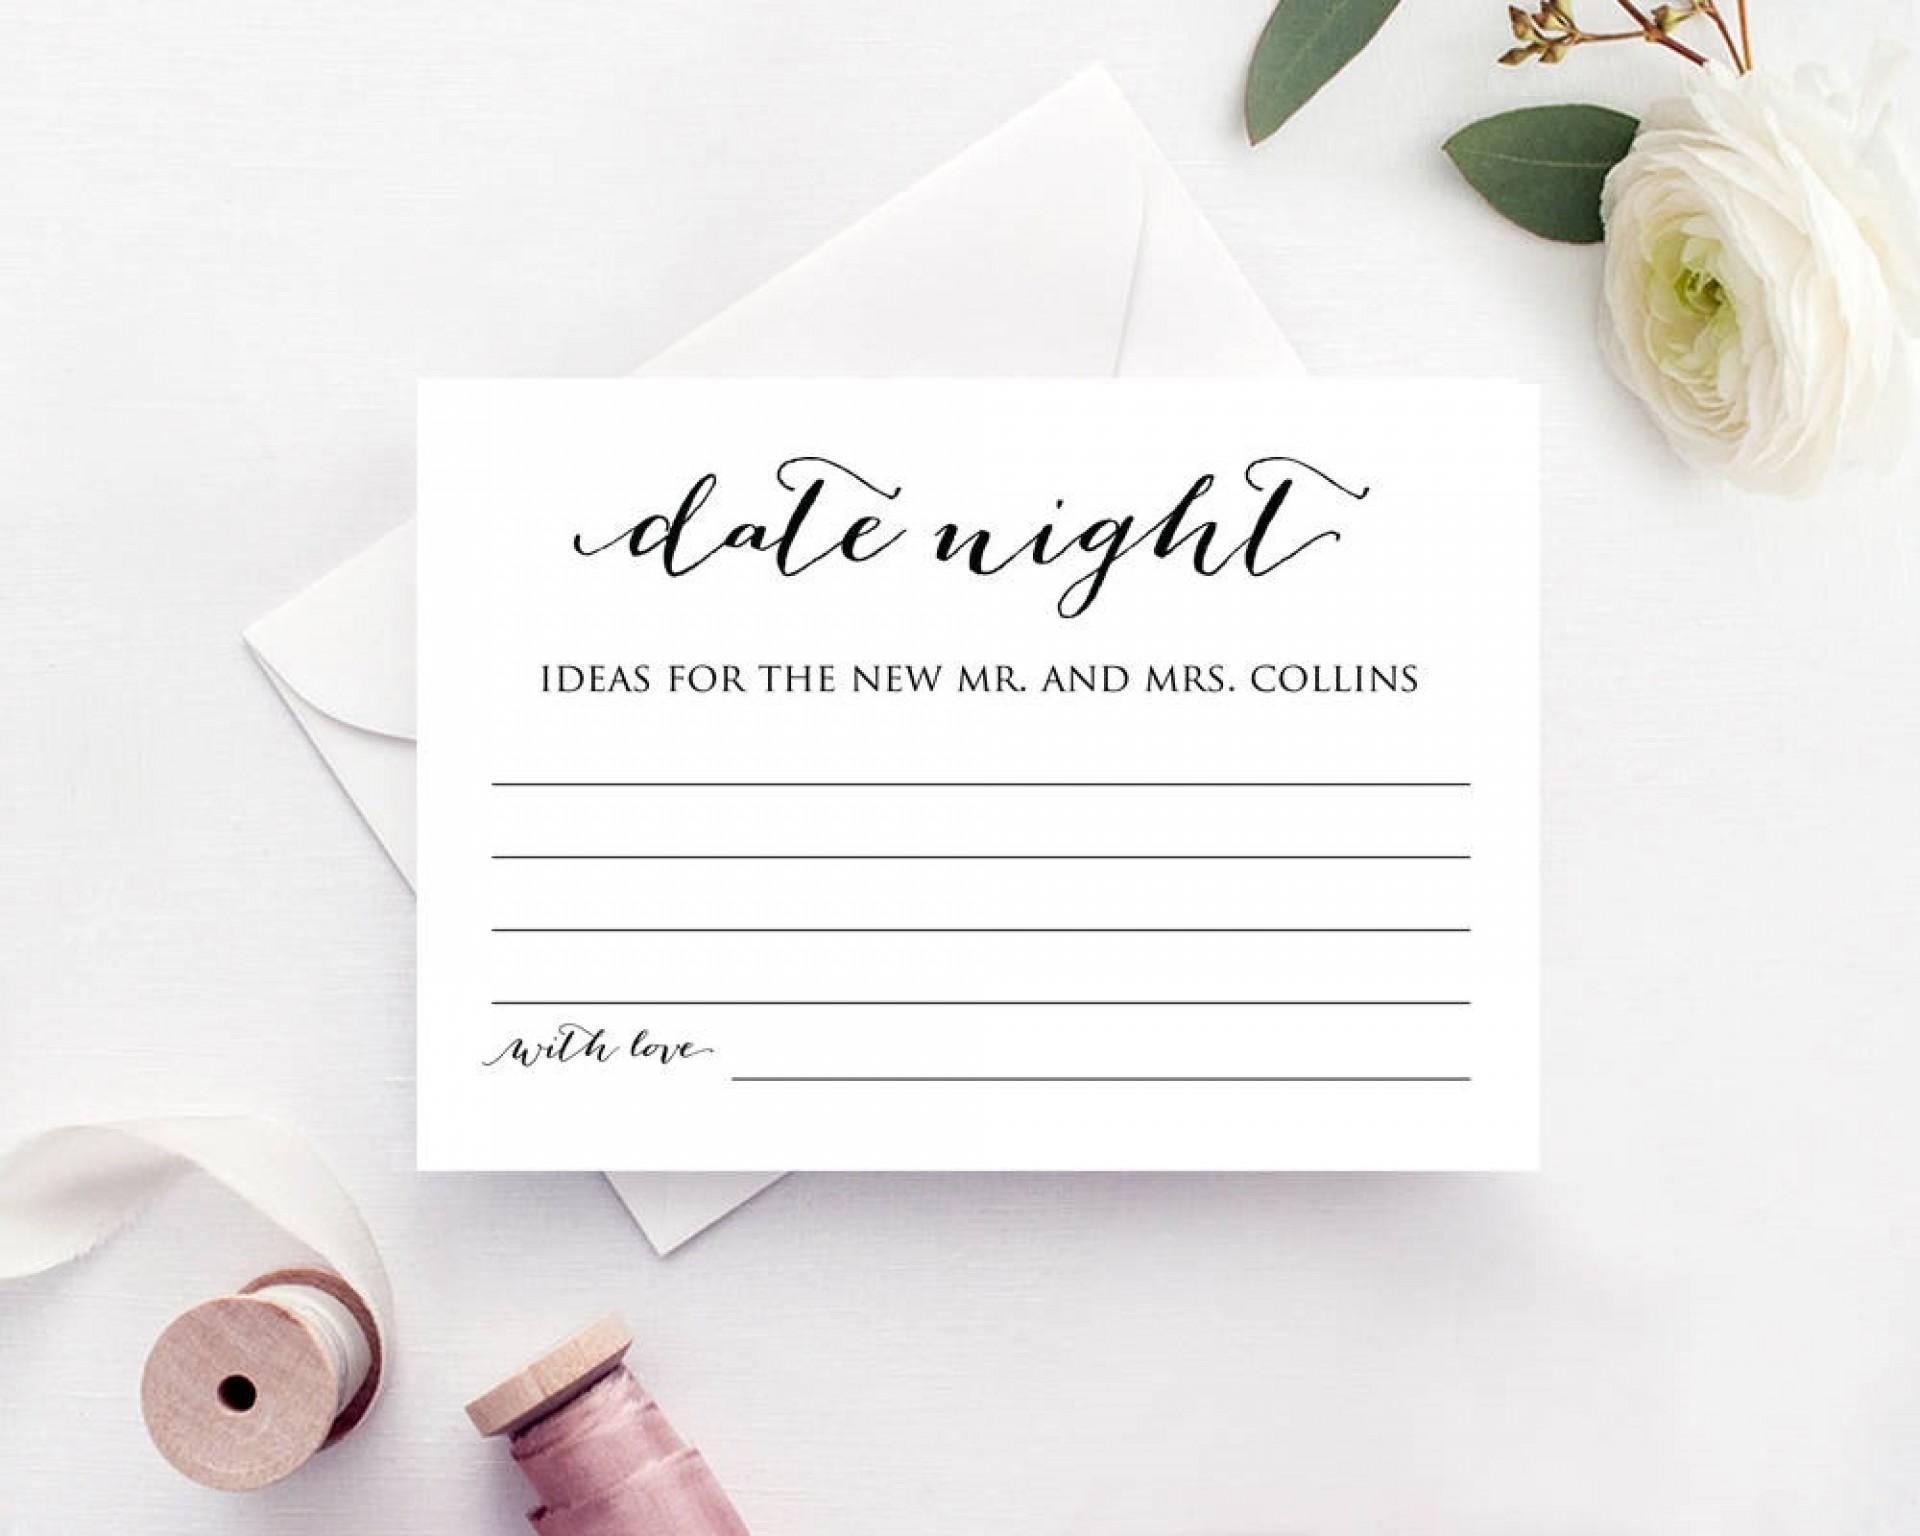 004 Fascinating Bridal Shower Card Template High Definition  Invitation Free Download Bingo1920